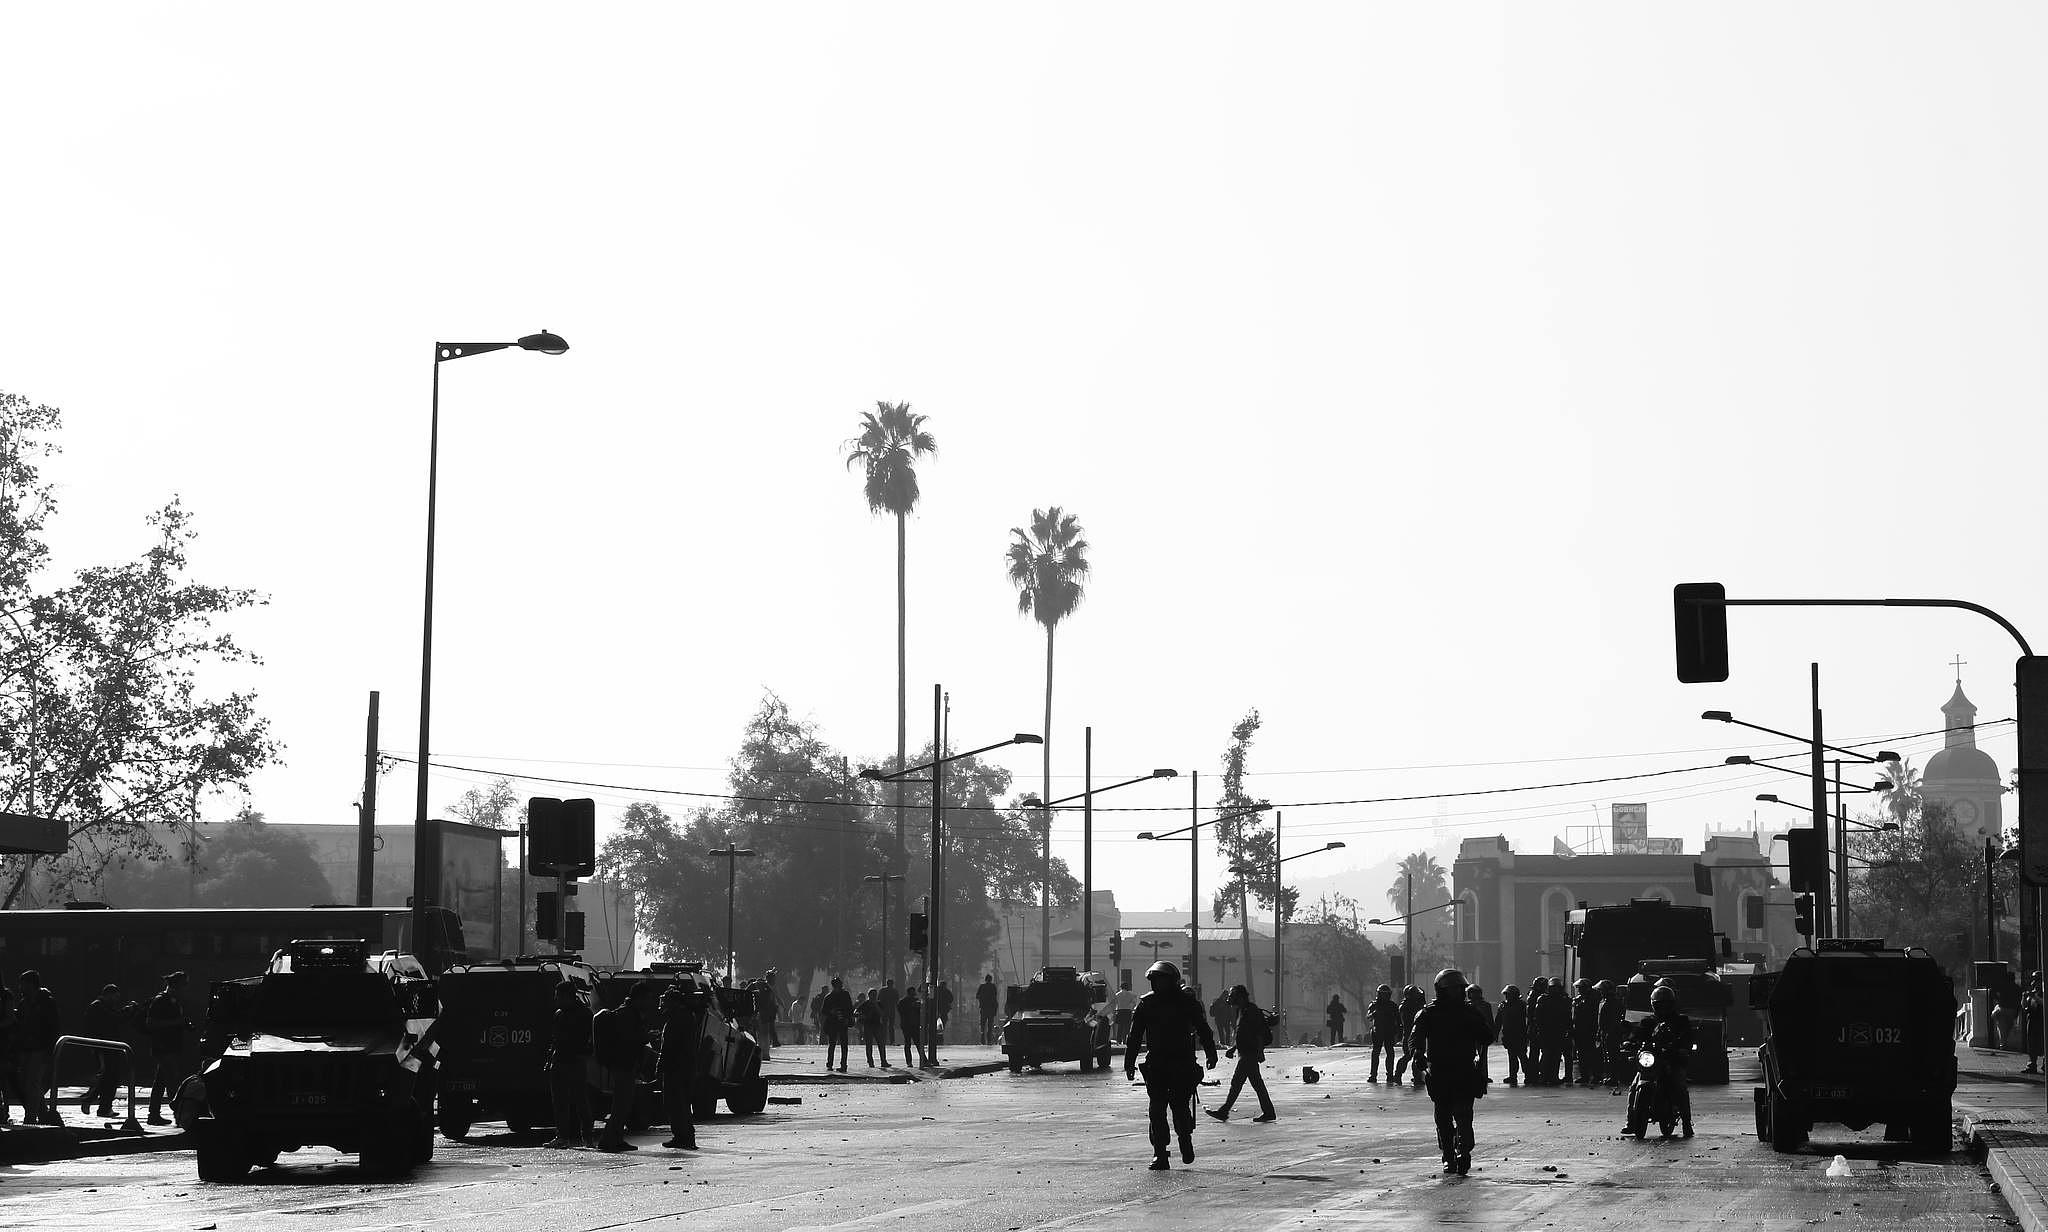 Land of the cops by MatiasAlvarezReyes